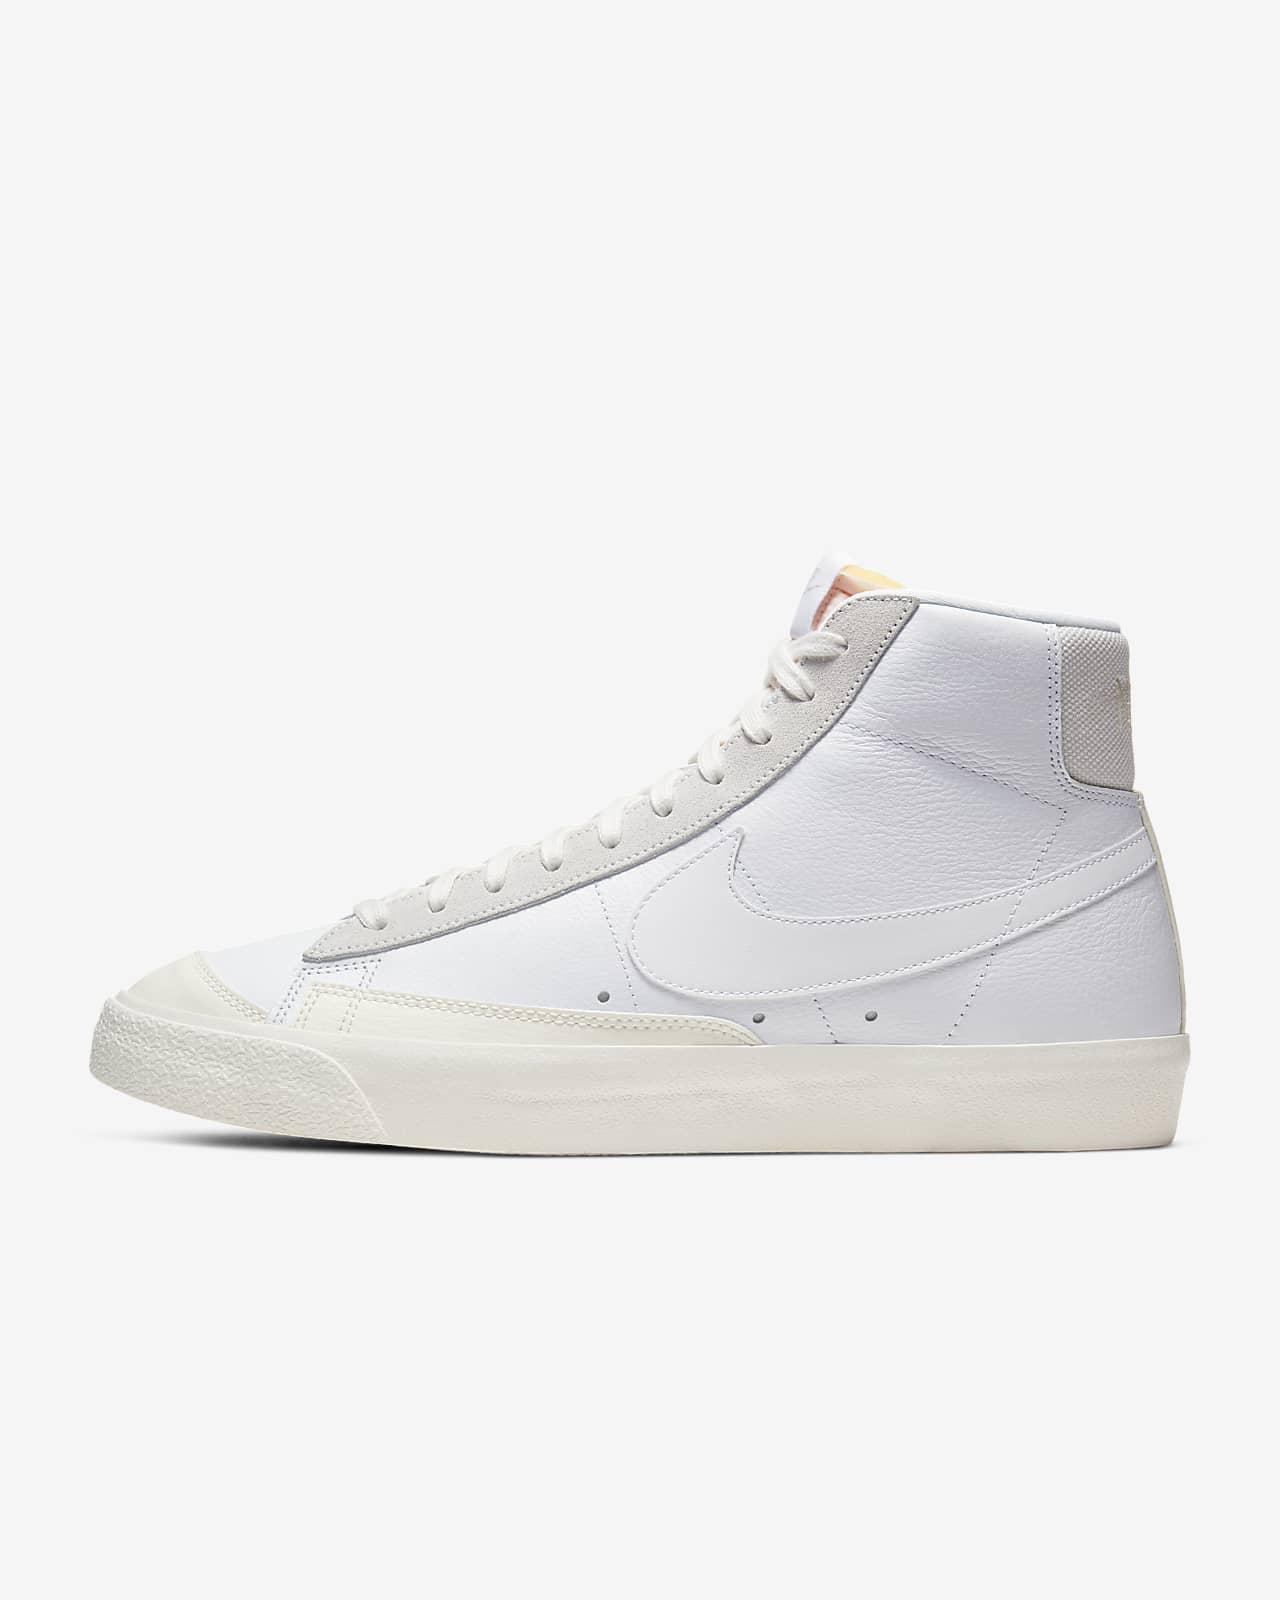 Chaussure Nike Blazer Mid Vintage '77 pour Homme